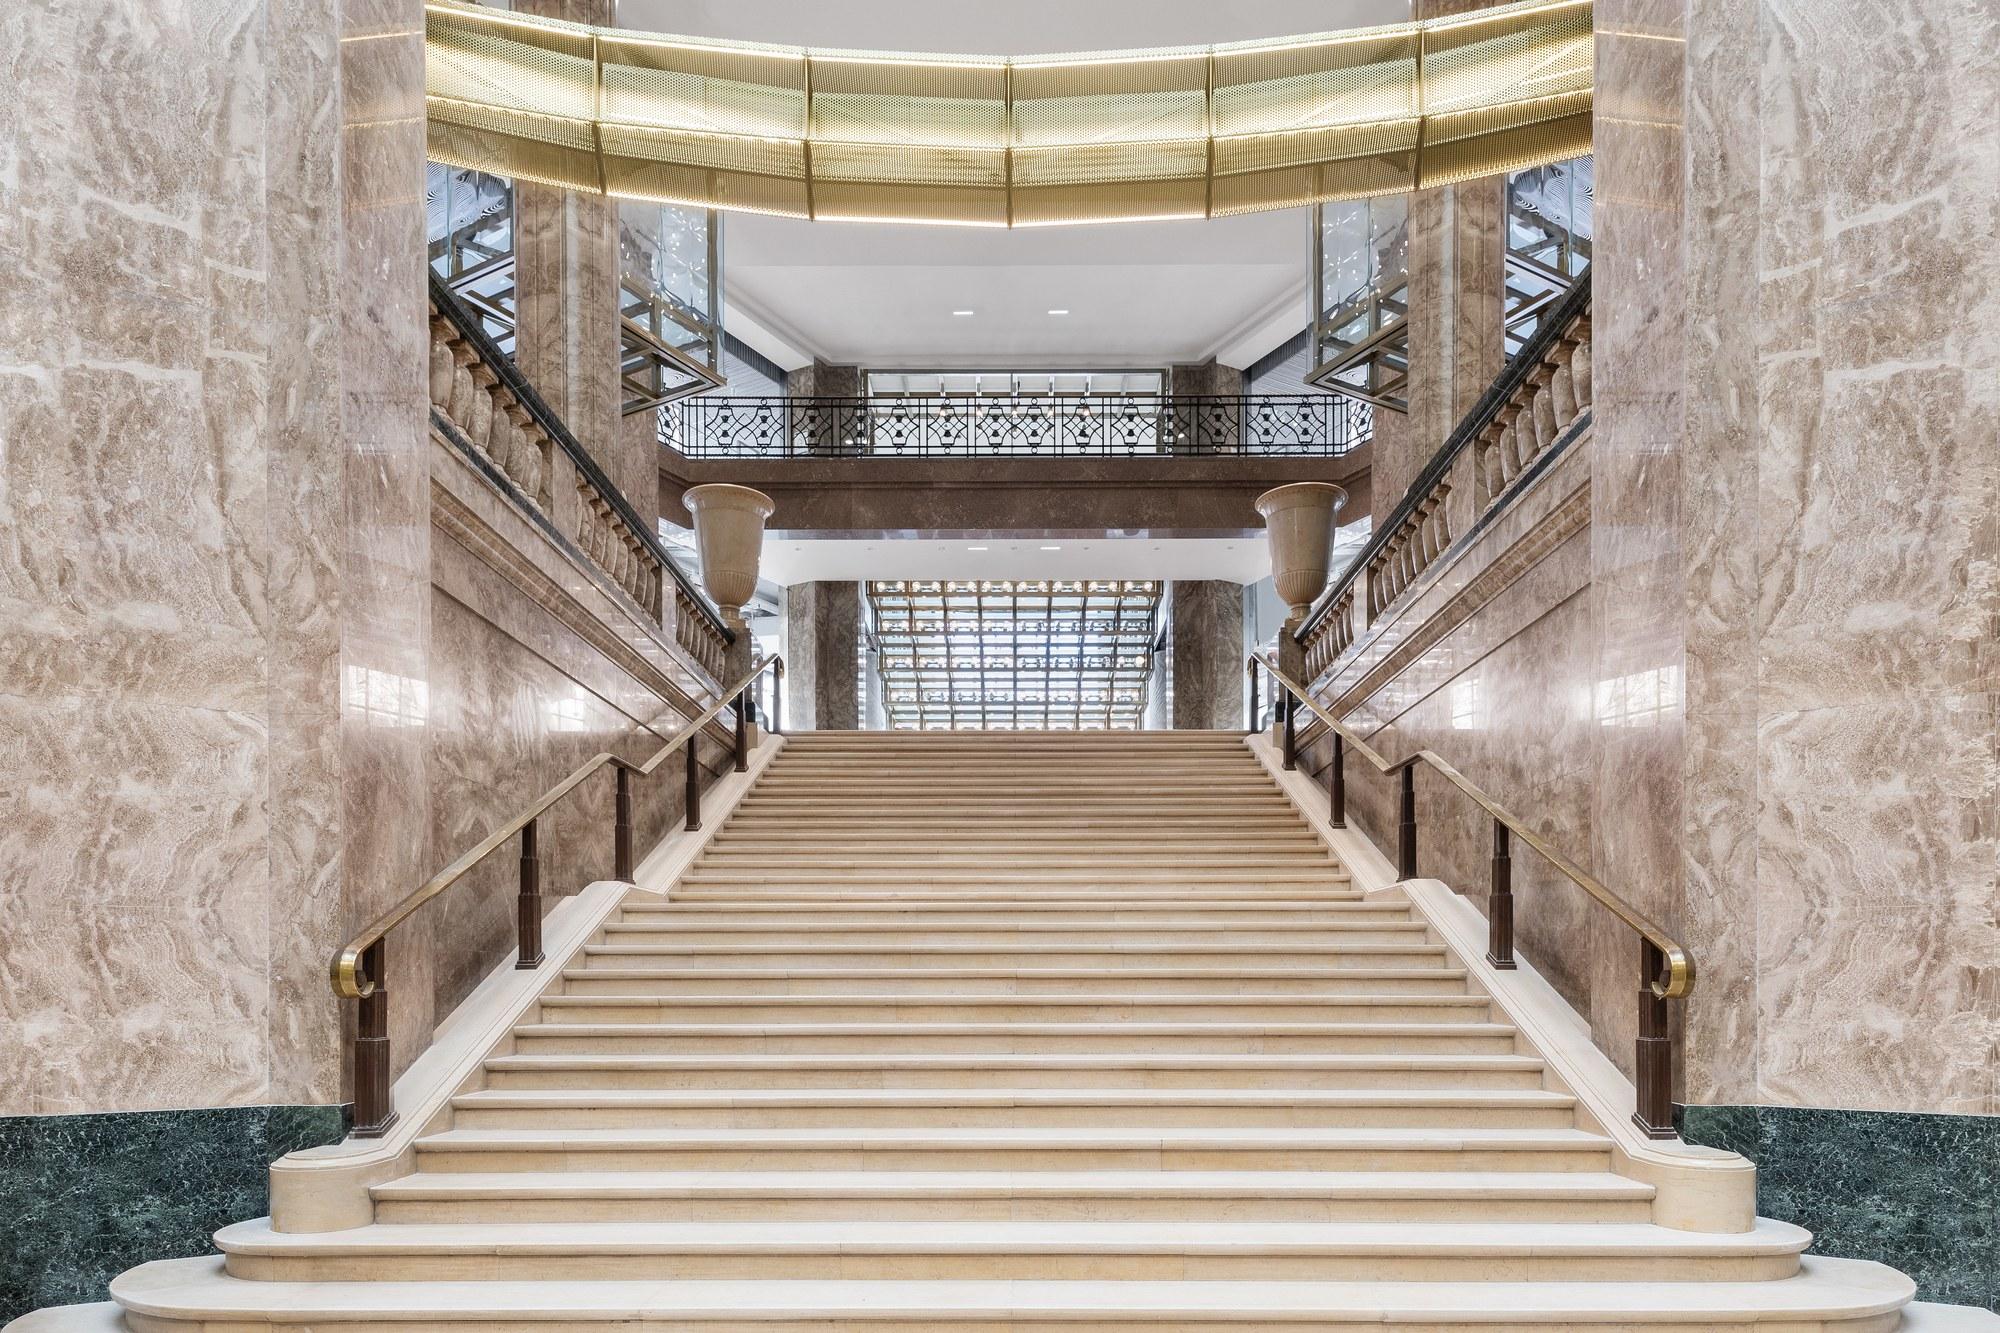 https://i.ibb.co/mc54ZT8/Galeries-Lafayette-Champs-Elys-es-Escalier-Art-D-co-mars-2019-c-Delfino-Sisto-Legnani-e-Marco-Cappelletti.jpg